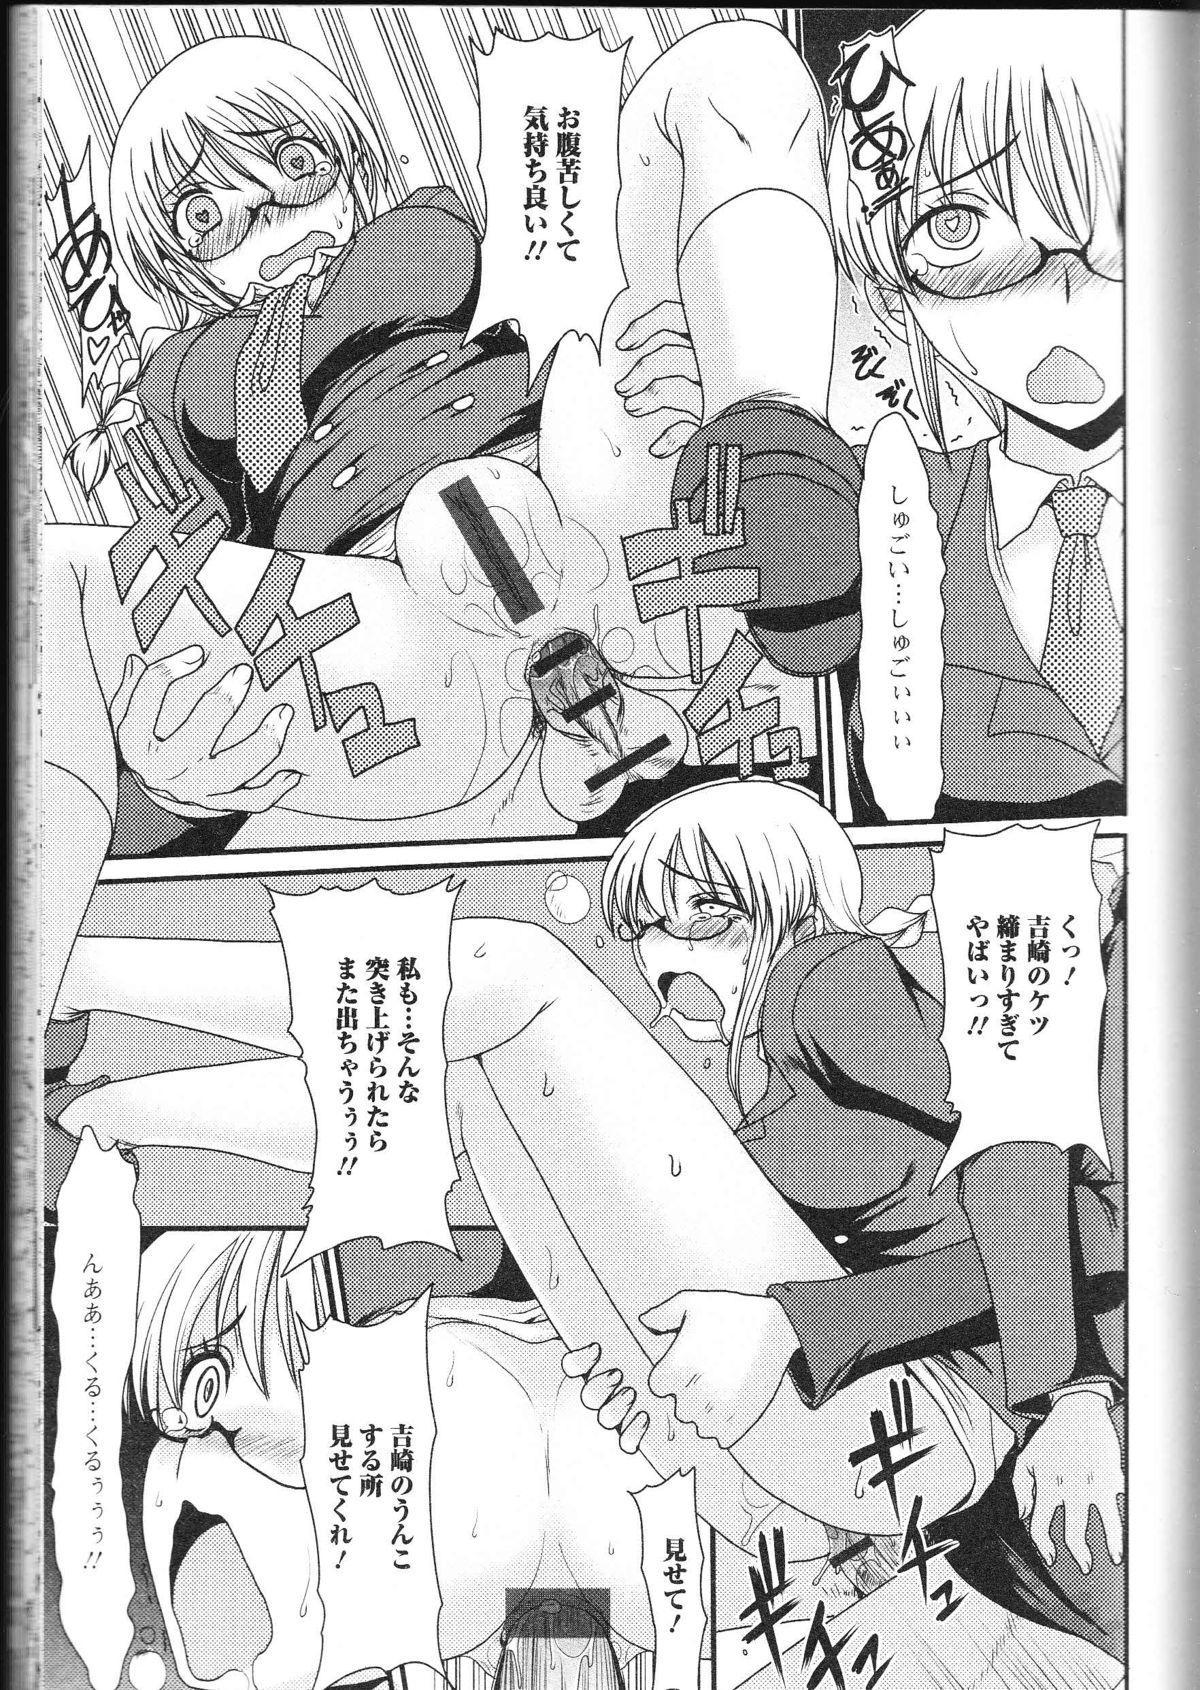 Nozoite wa Ikenai 9 - Do Not Peep! 9 121